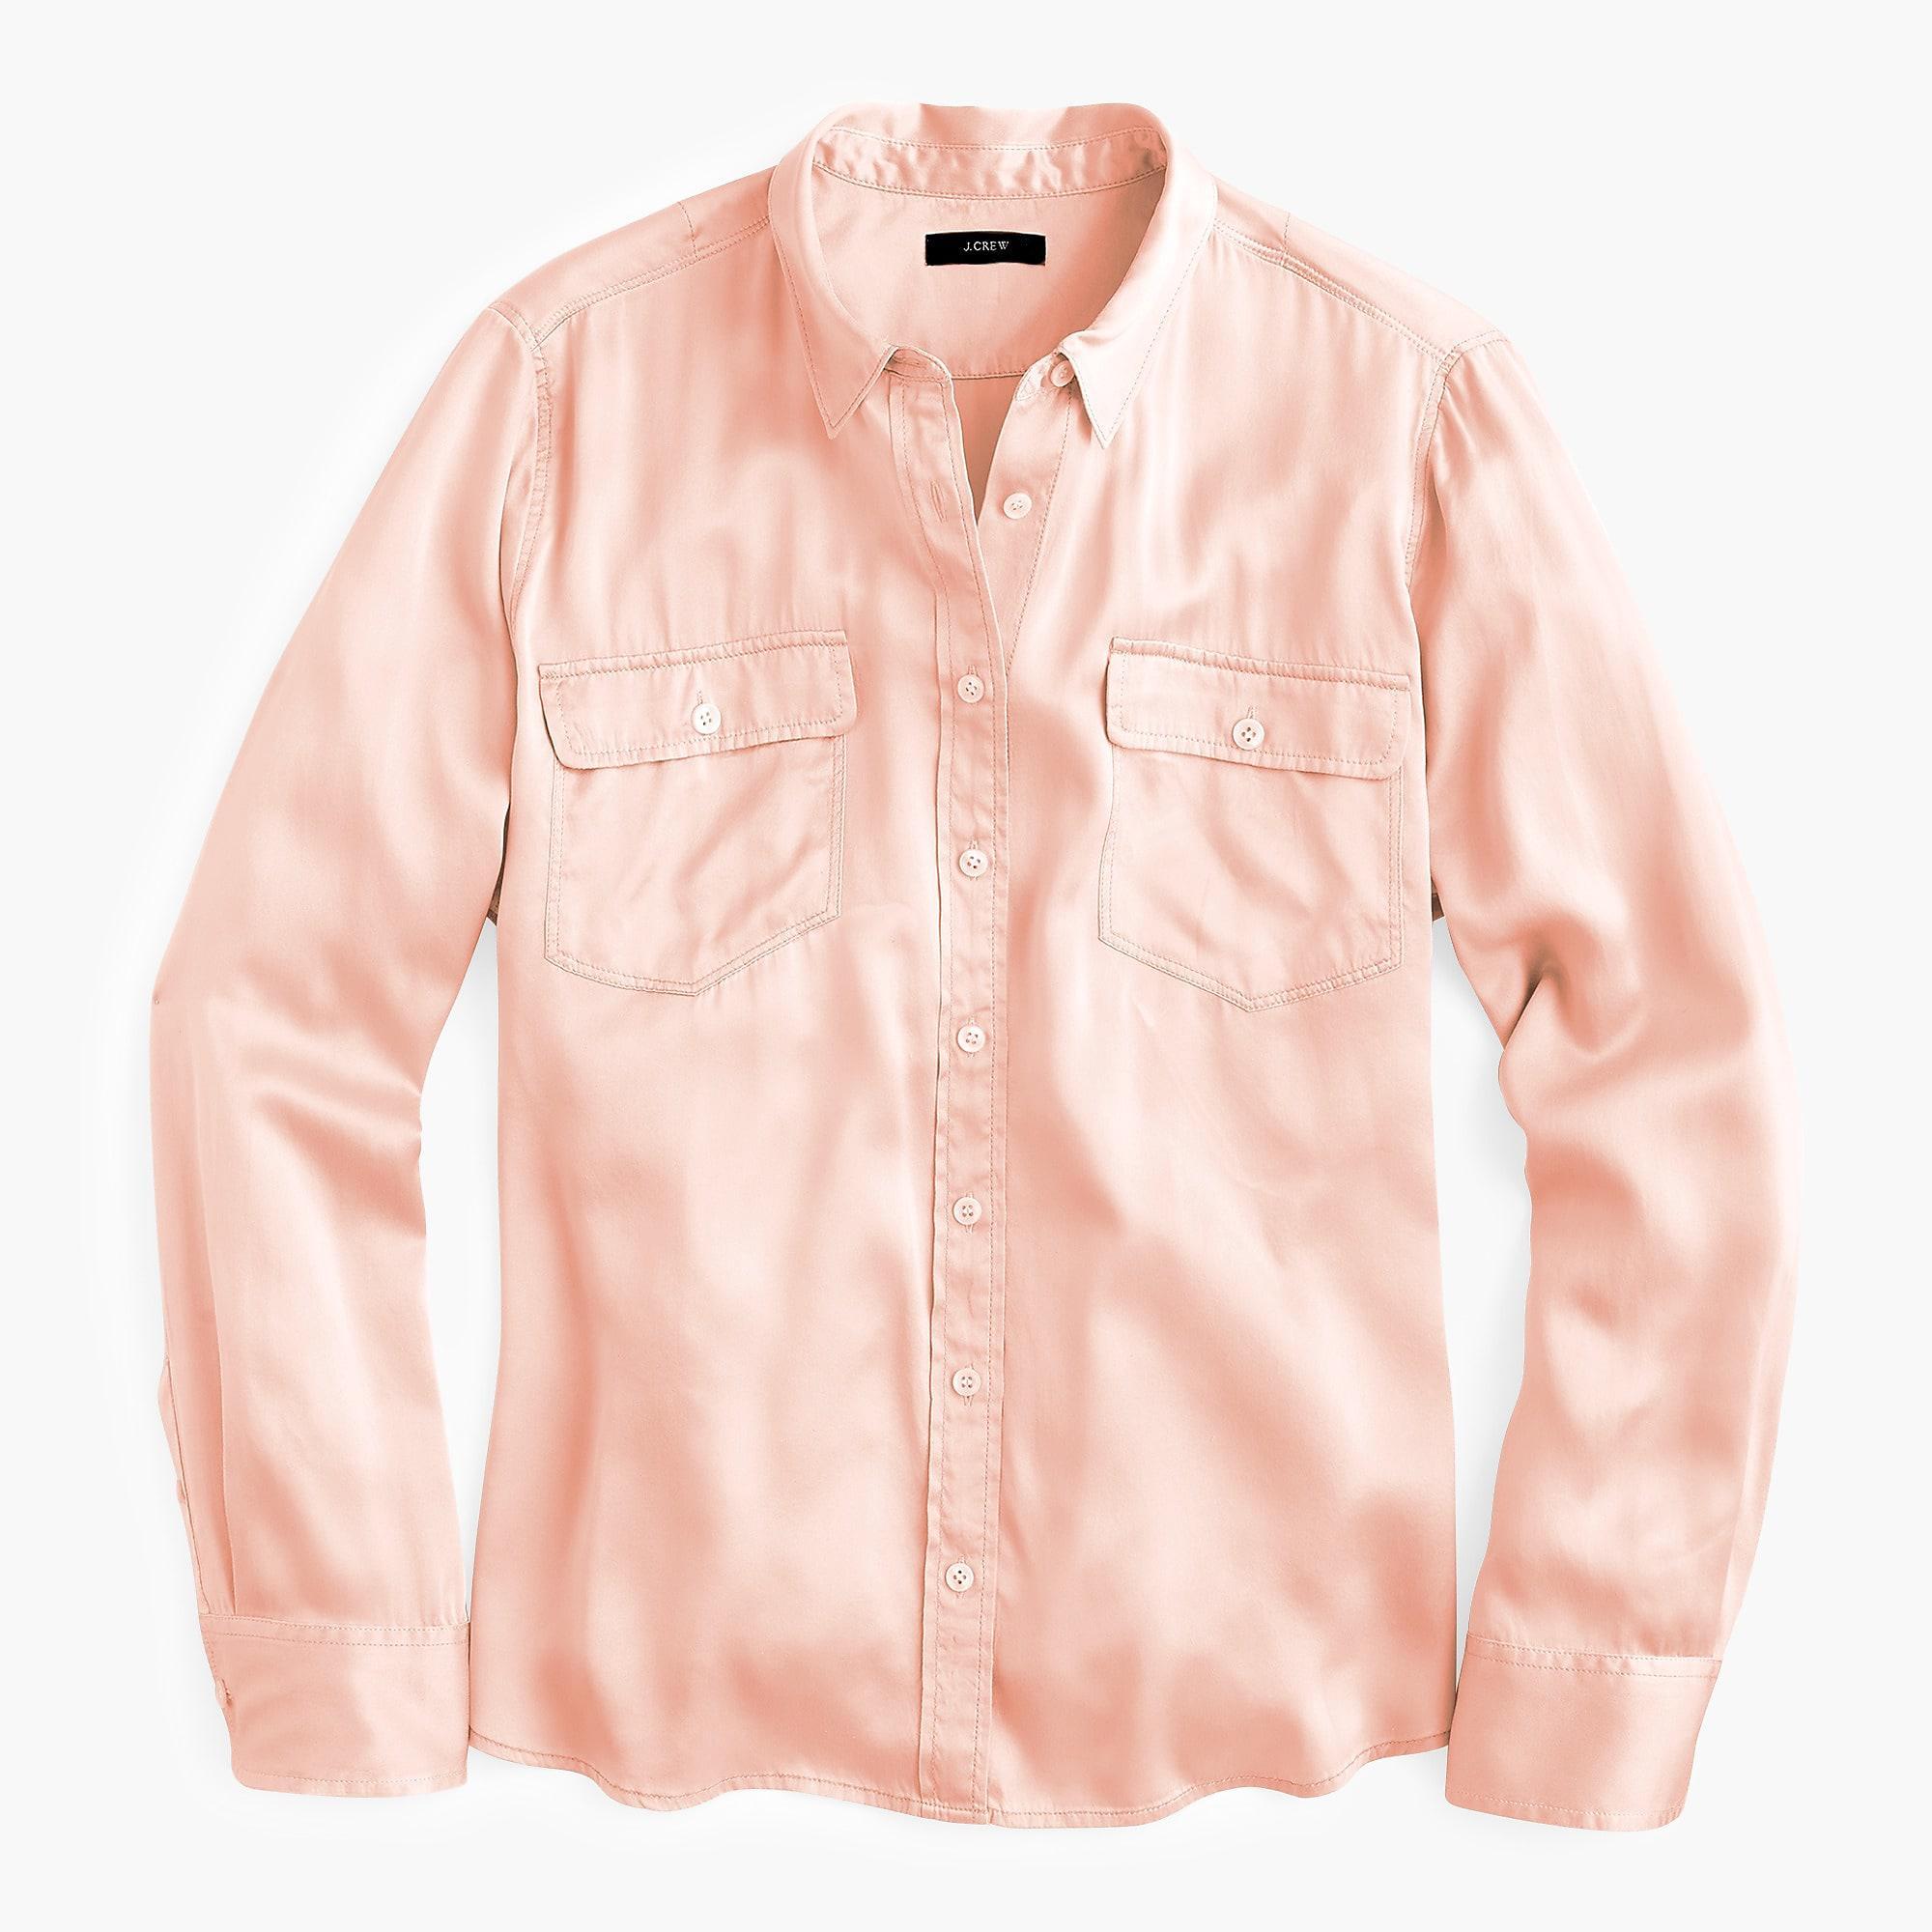 a32f0e3d3c1dc3 J.Crew Women's 2011 Blythe Shirt in Pink - Lyst